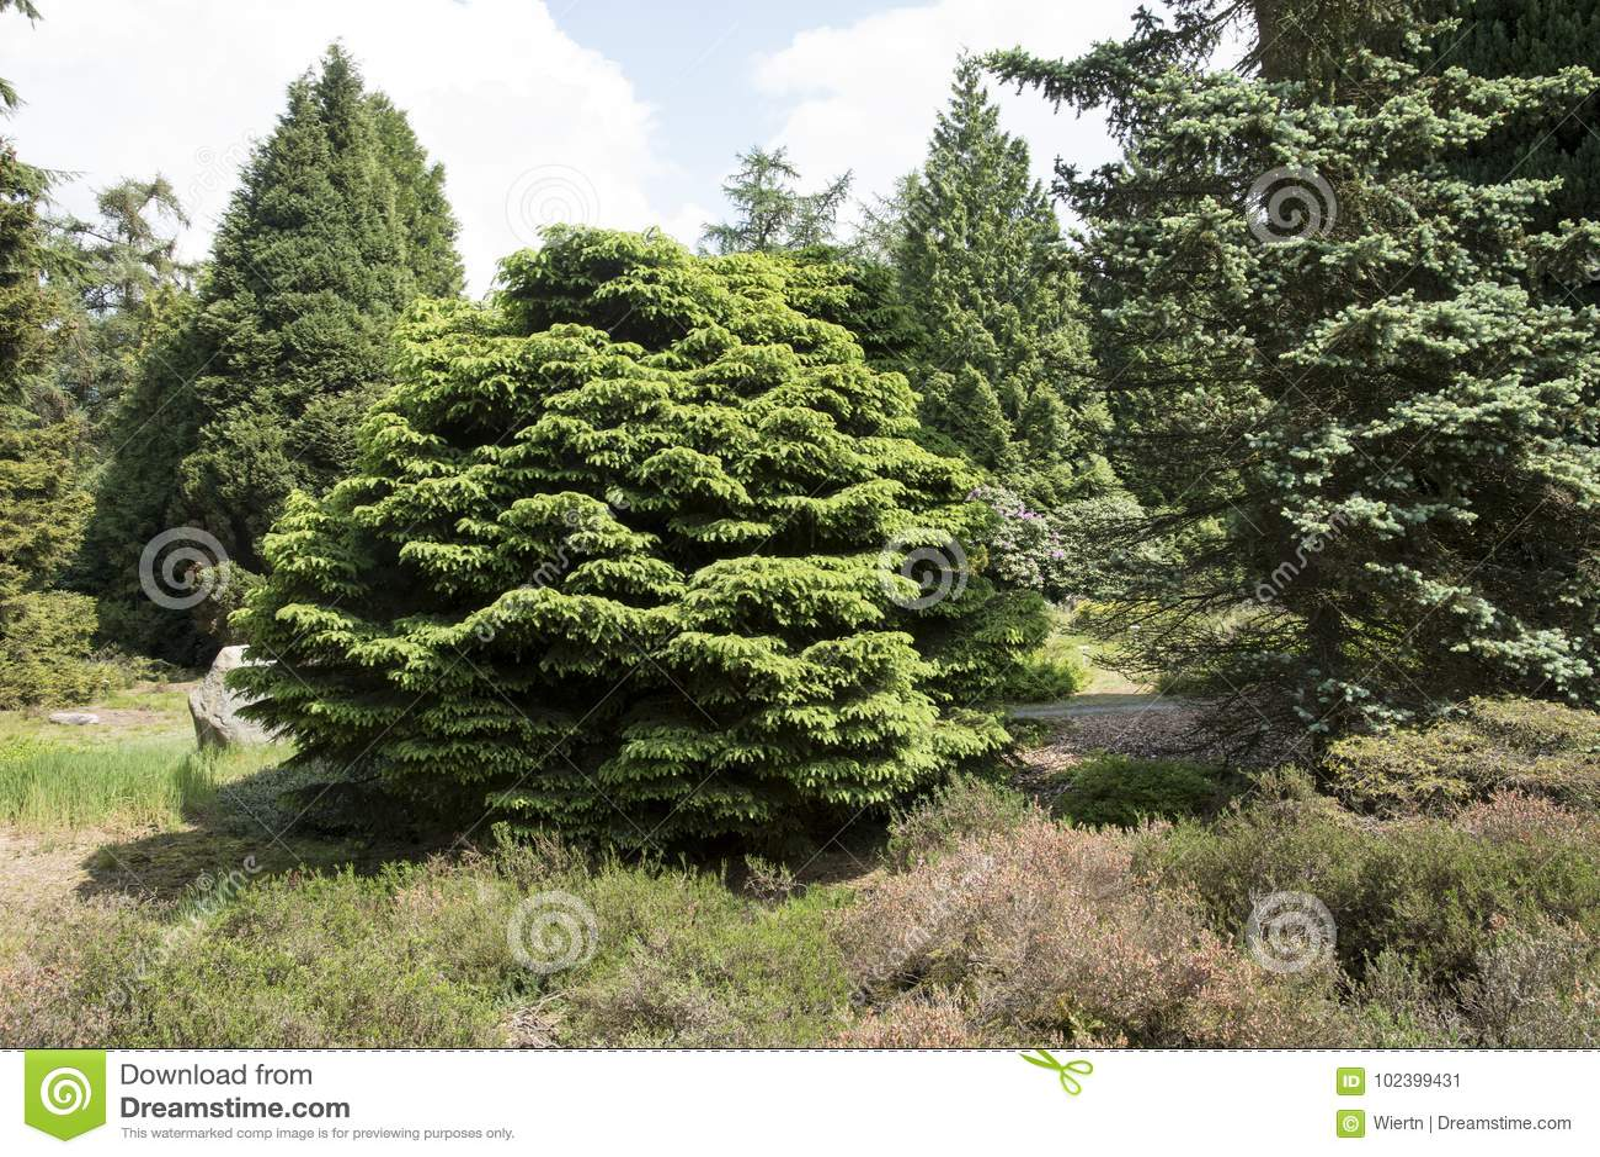 Picea Abies Pumila Nigra Stock Image Image Of Evergreen 102399431